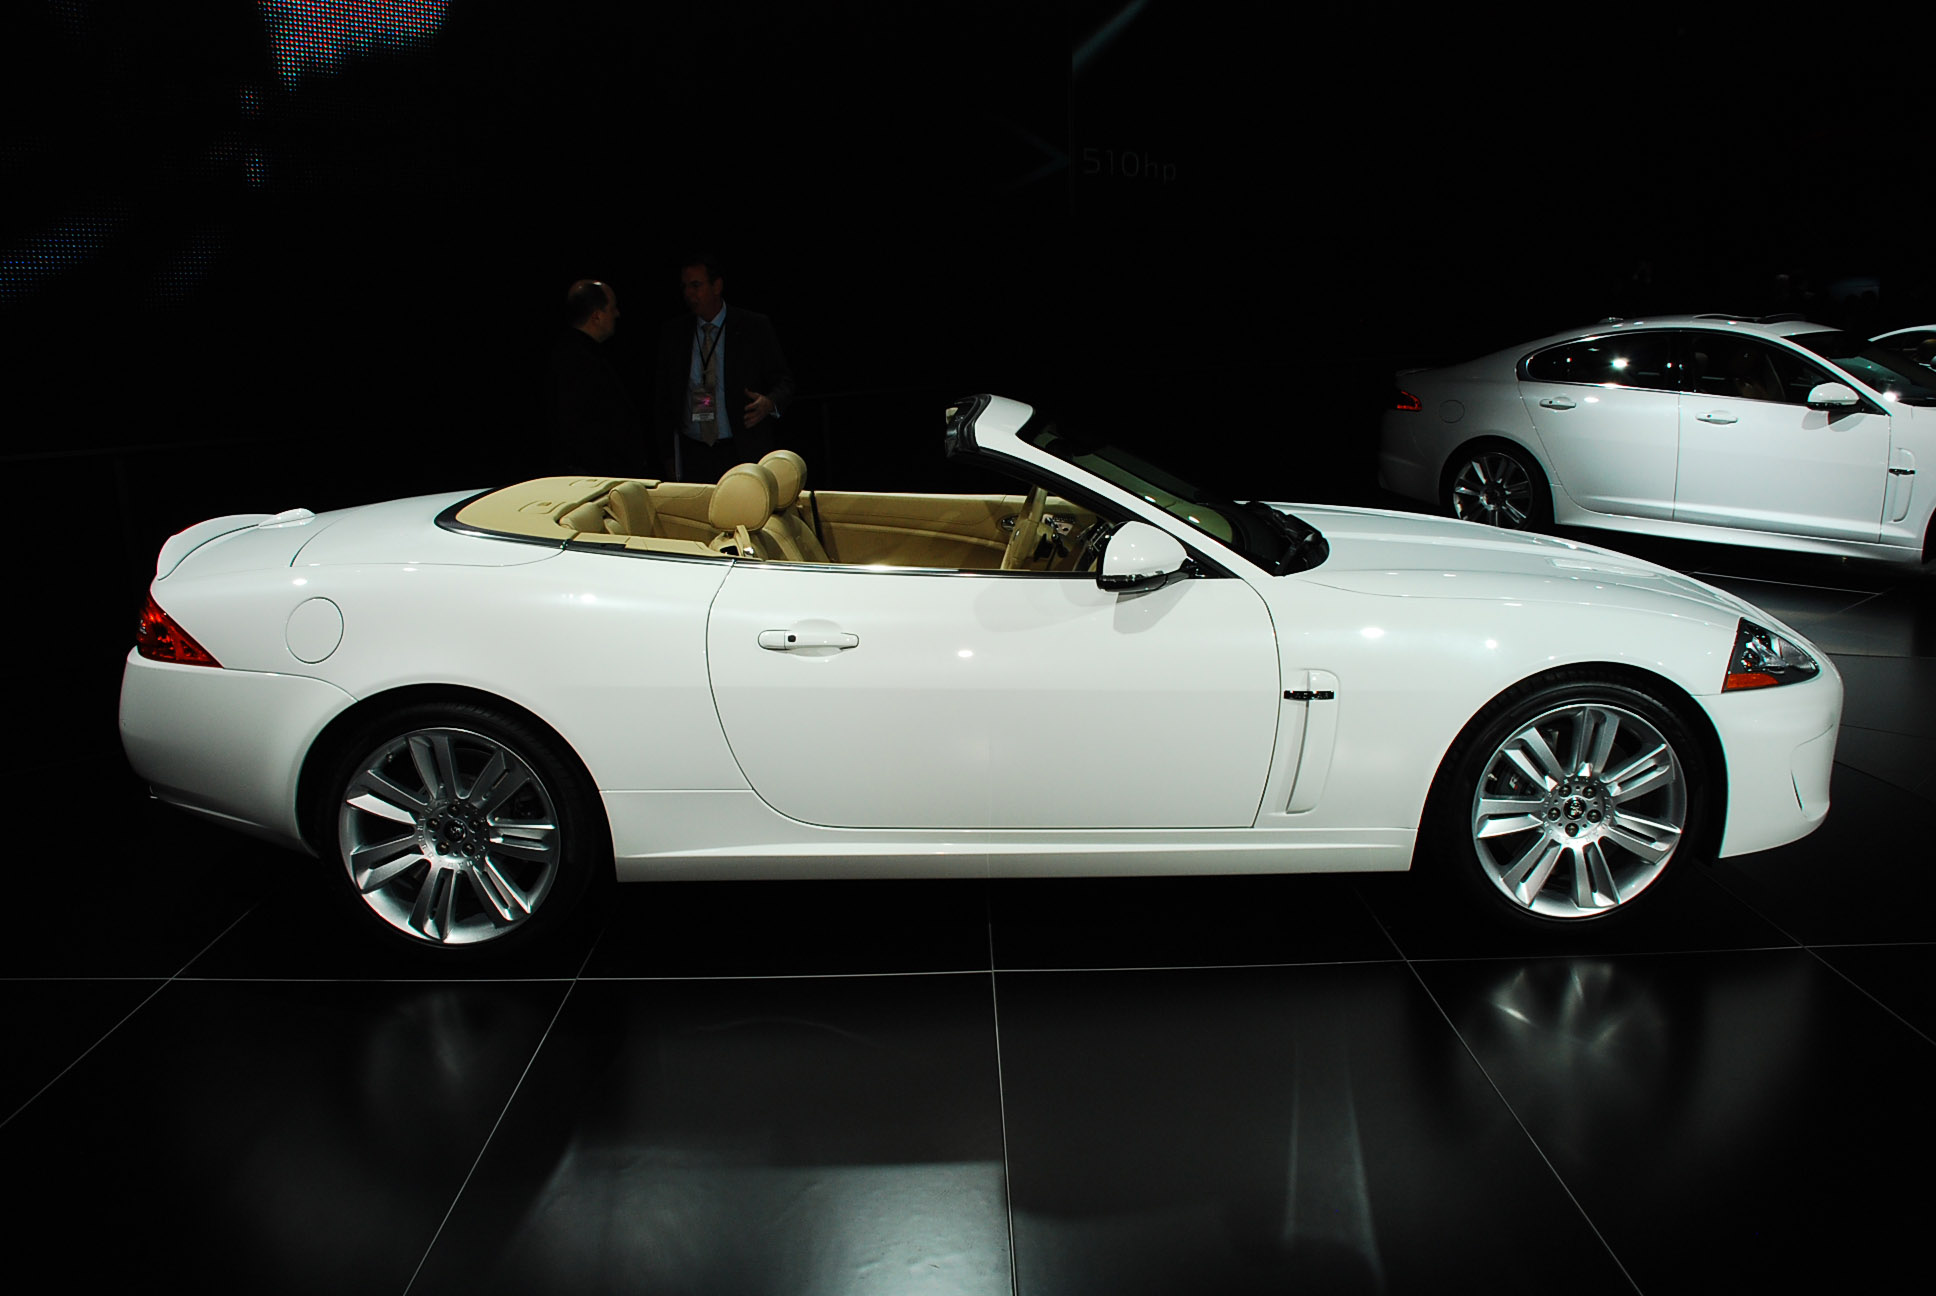 Used 2009 Jaguar Xk For Sale Pricing Features Edmunds